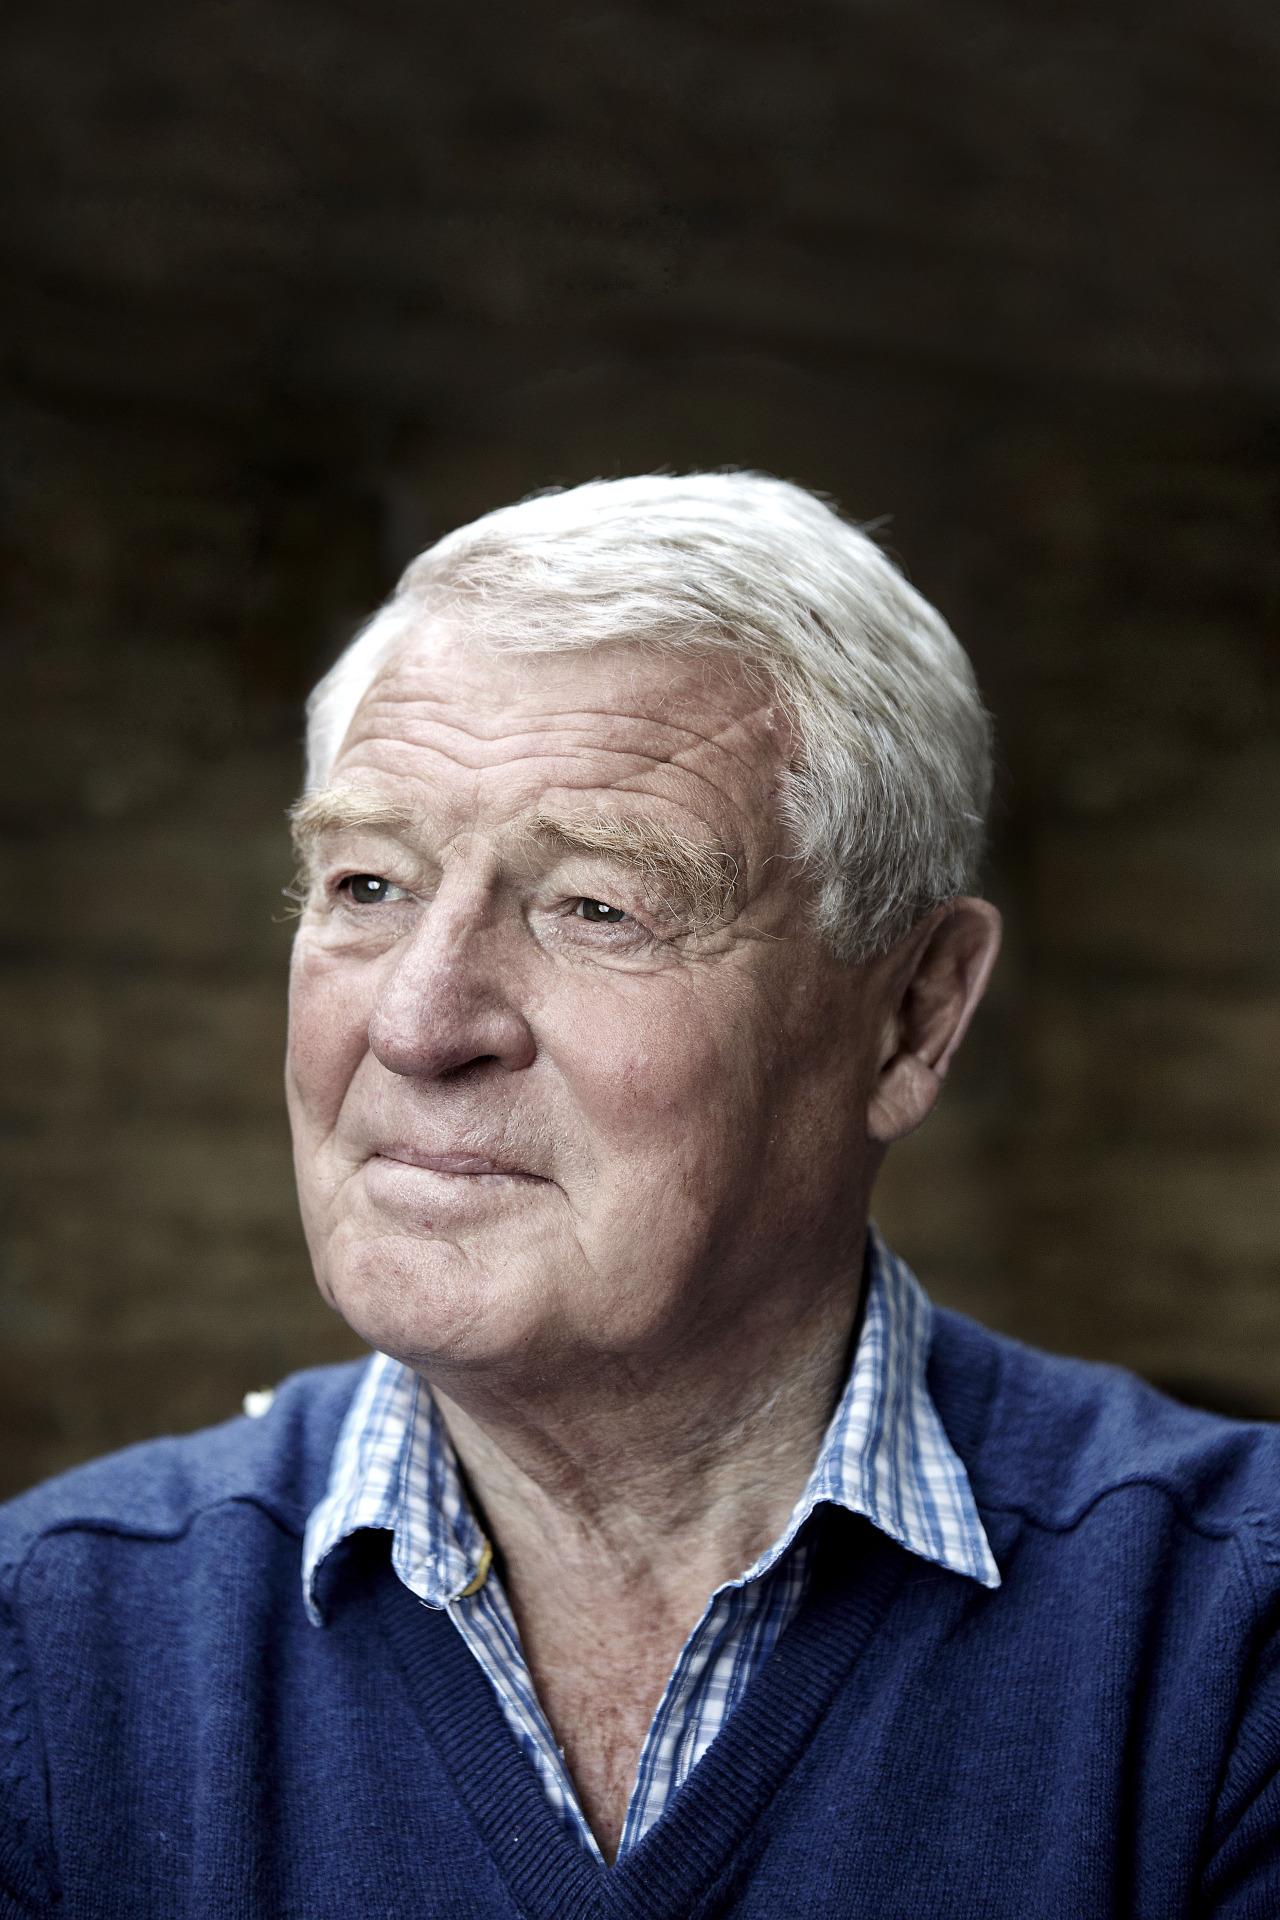 oliveredwardsphotography :     Paddy Ashdown for BBC History     reblog - Paddy Ashdown for BBC History